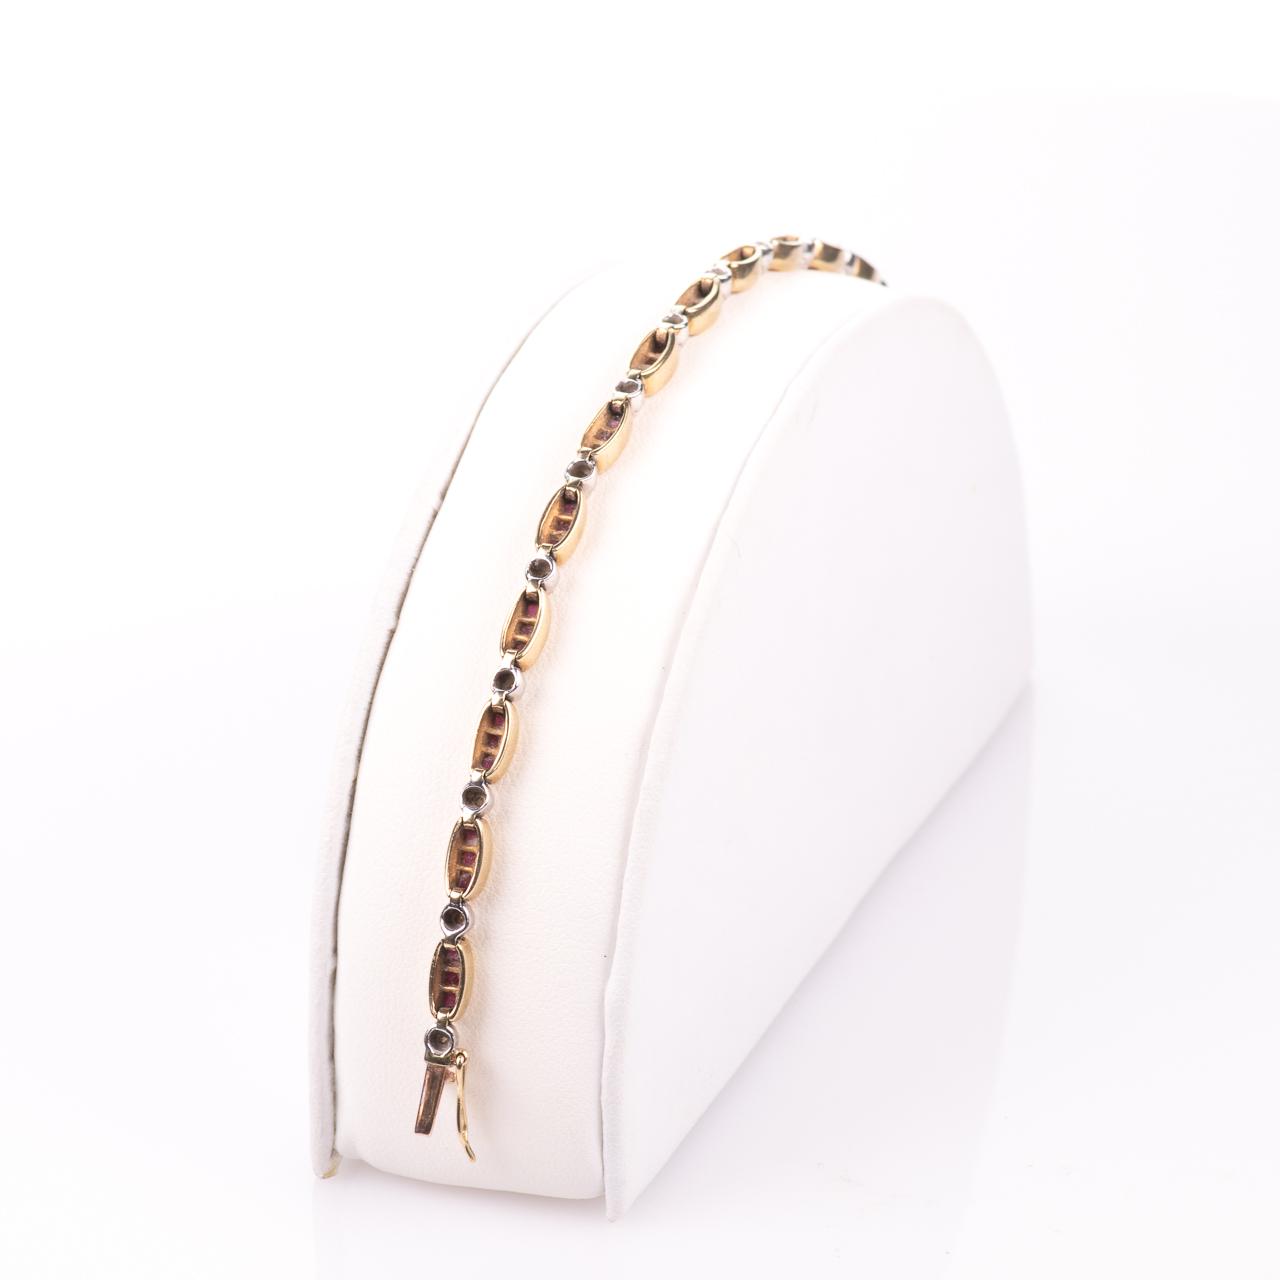 9ct Gold 2ct Ruby & Diamond Tennis Bracelet - Image 6 of 6